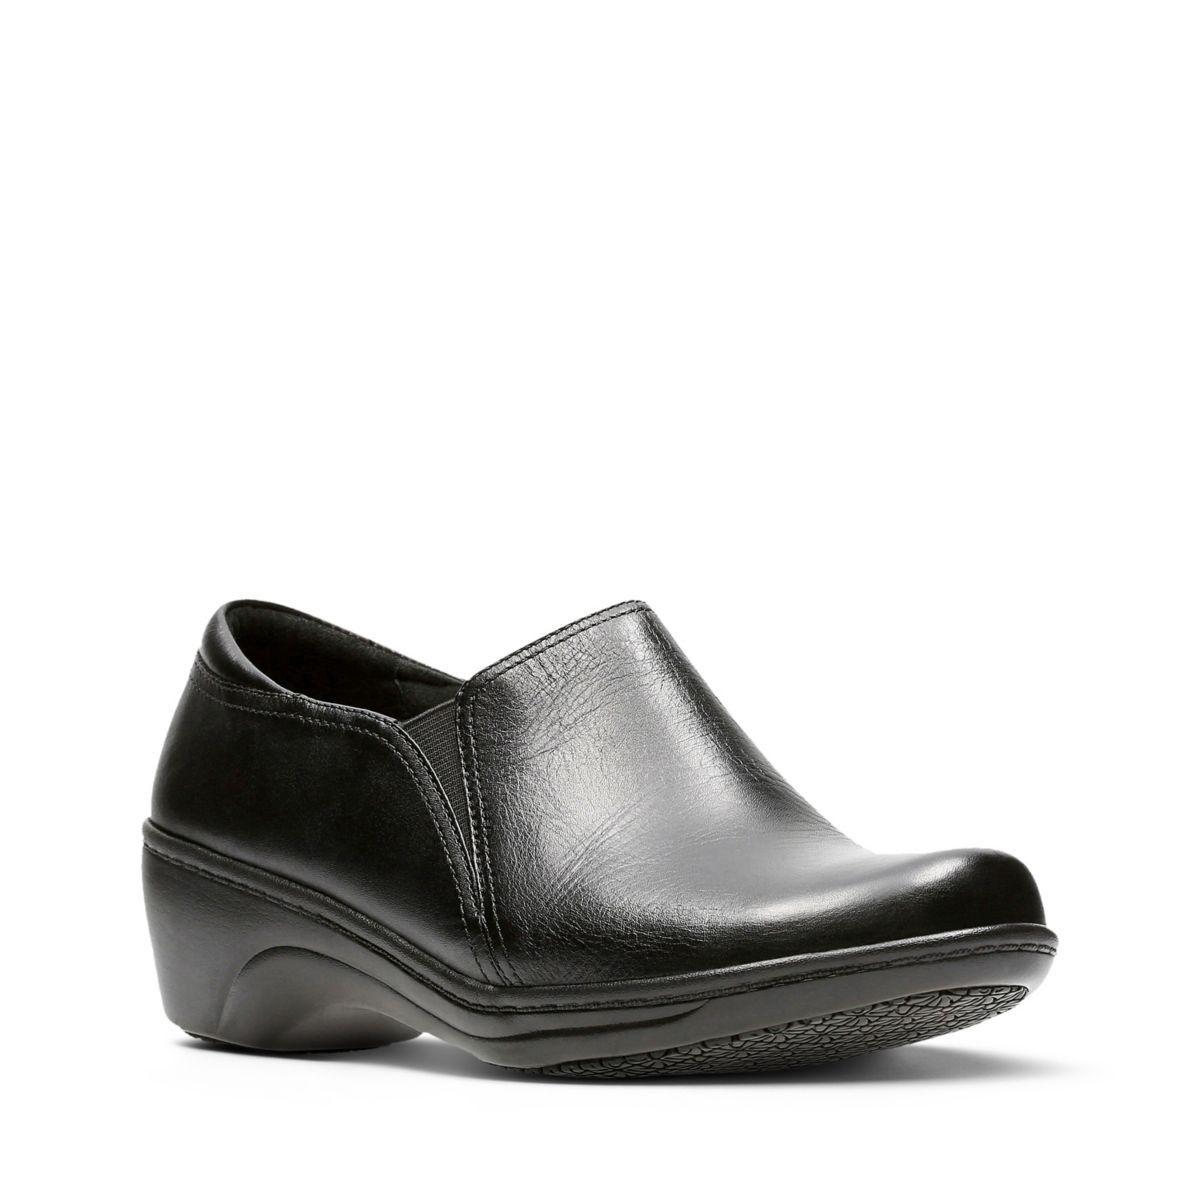 b433e4b031e Clarks Grasp Chime - Womens Shoes Black 6.5 D (Medium)